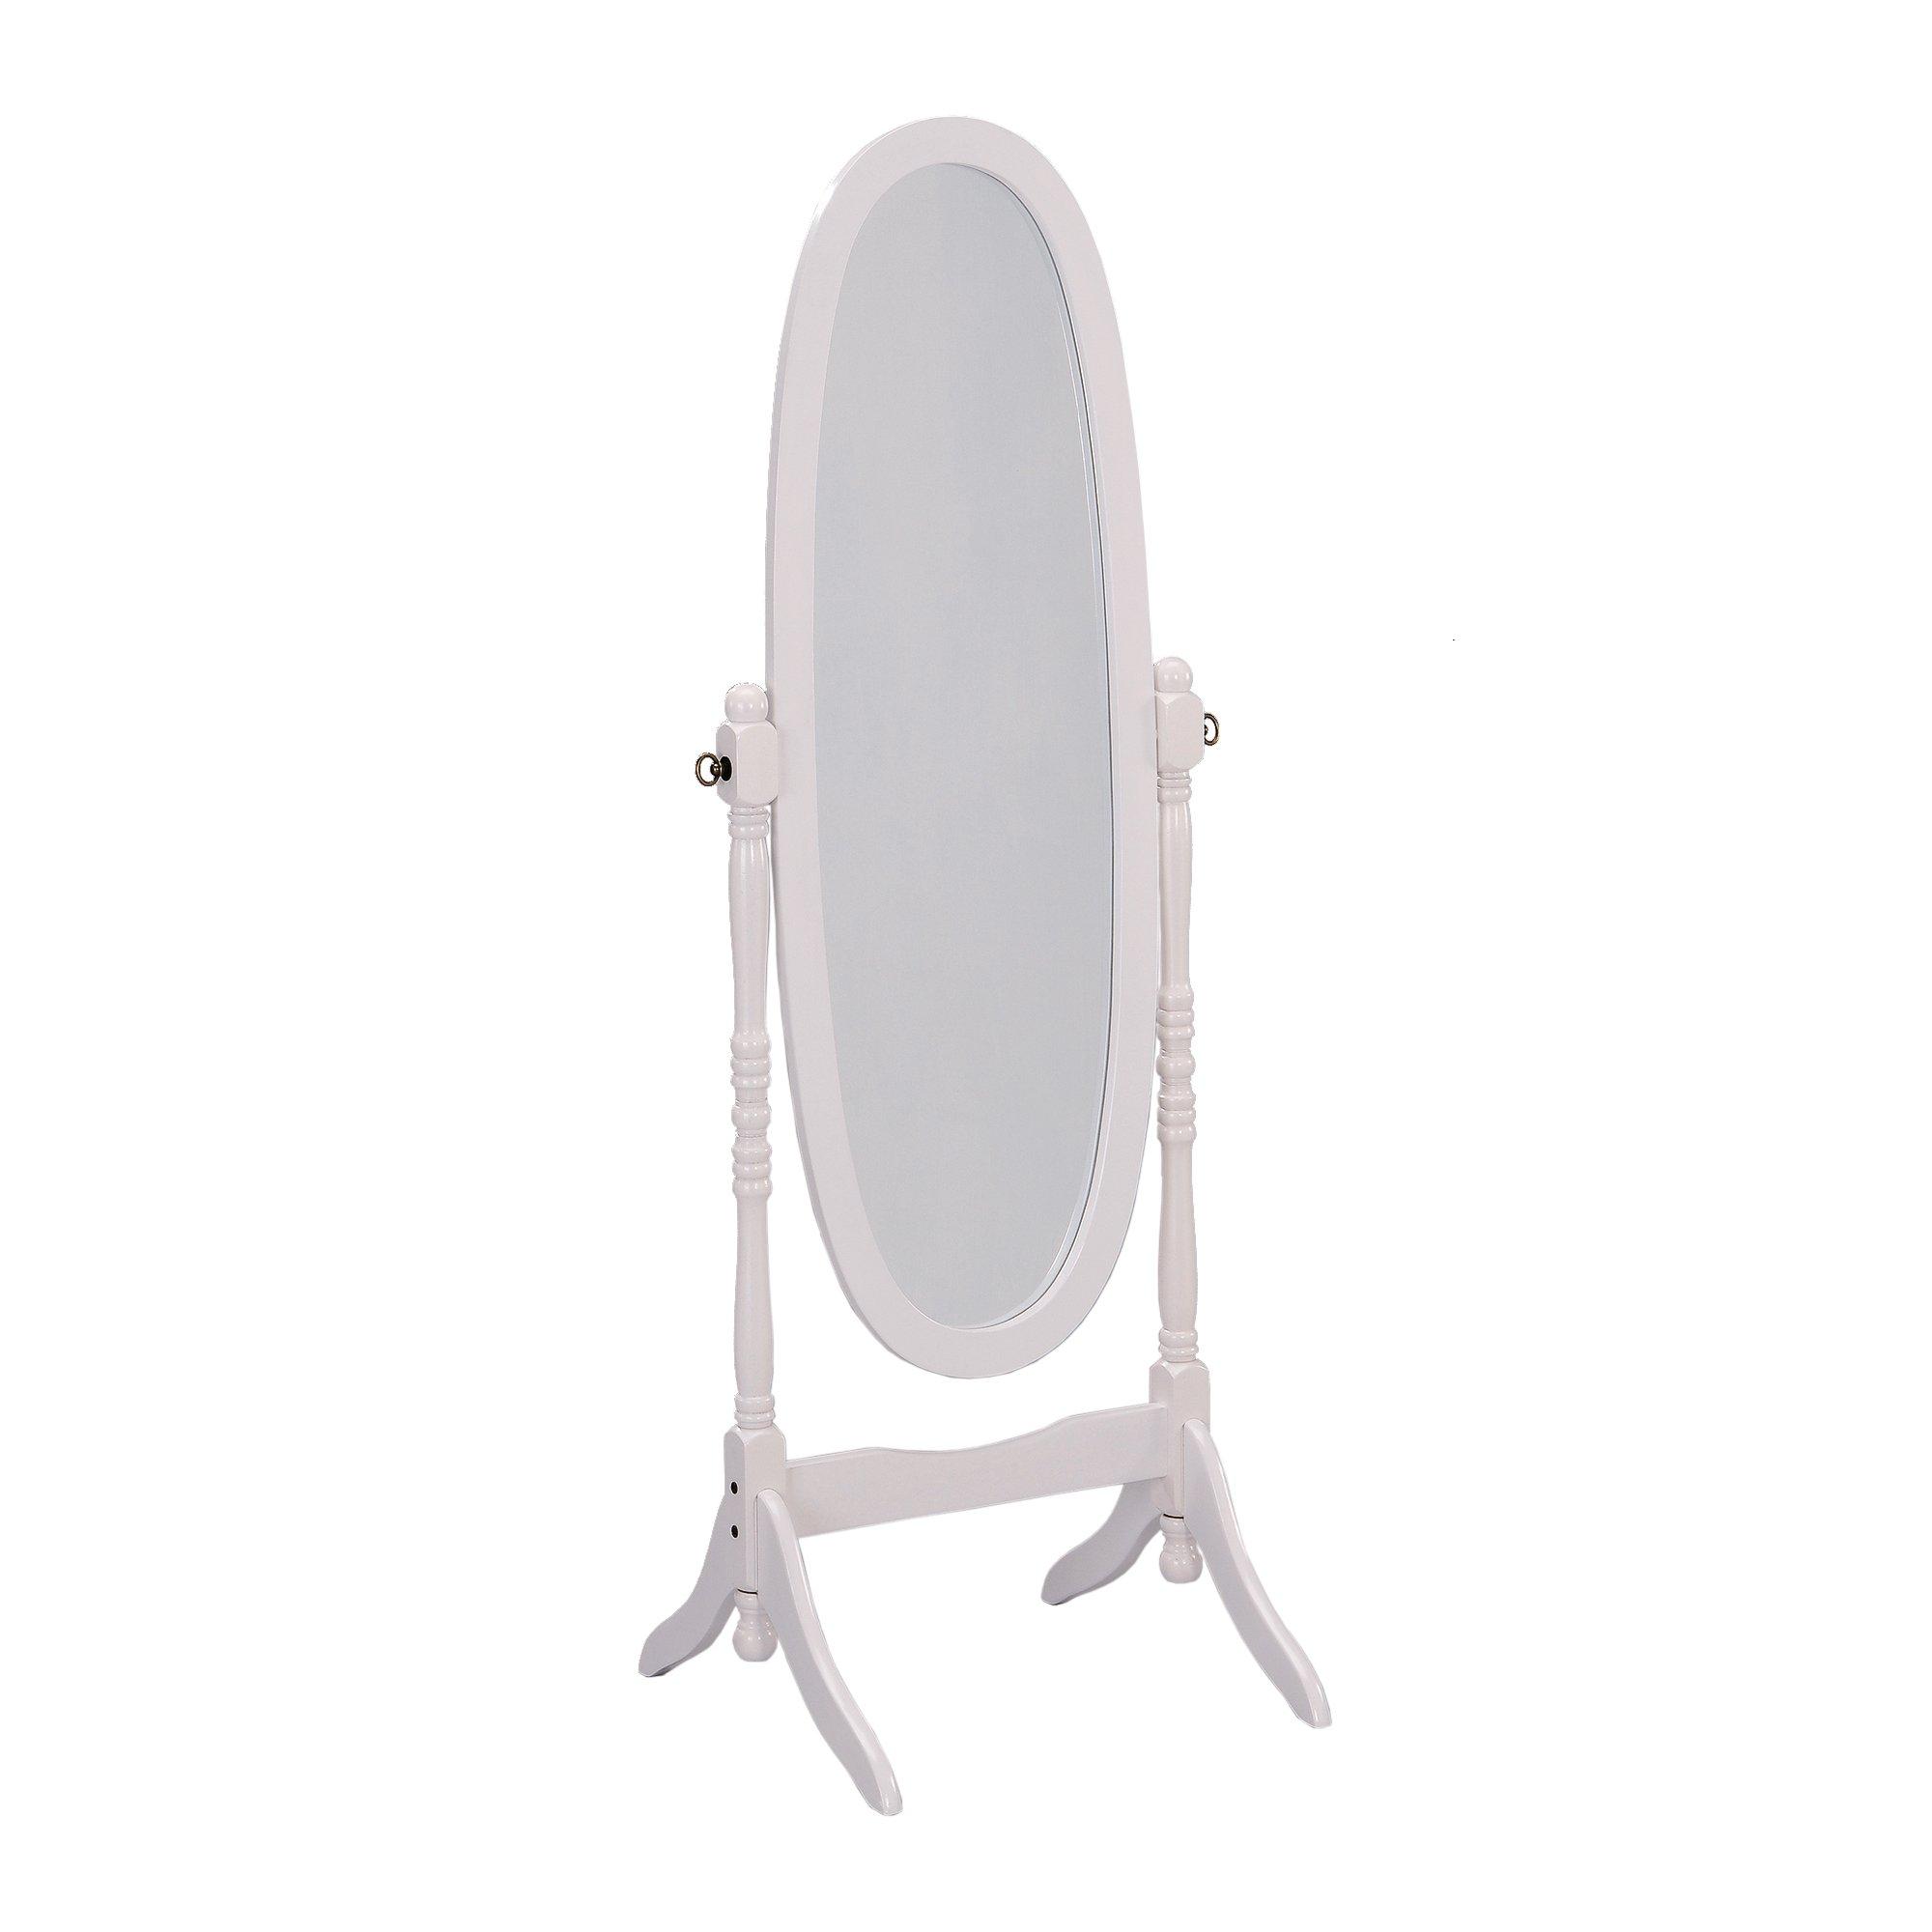 ORE International Cheval Standing Mirror, 59.5'' Height, White Finish